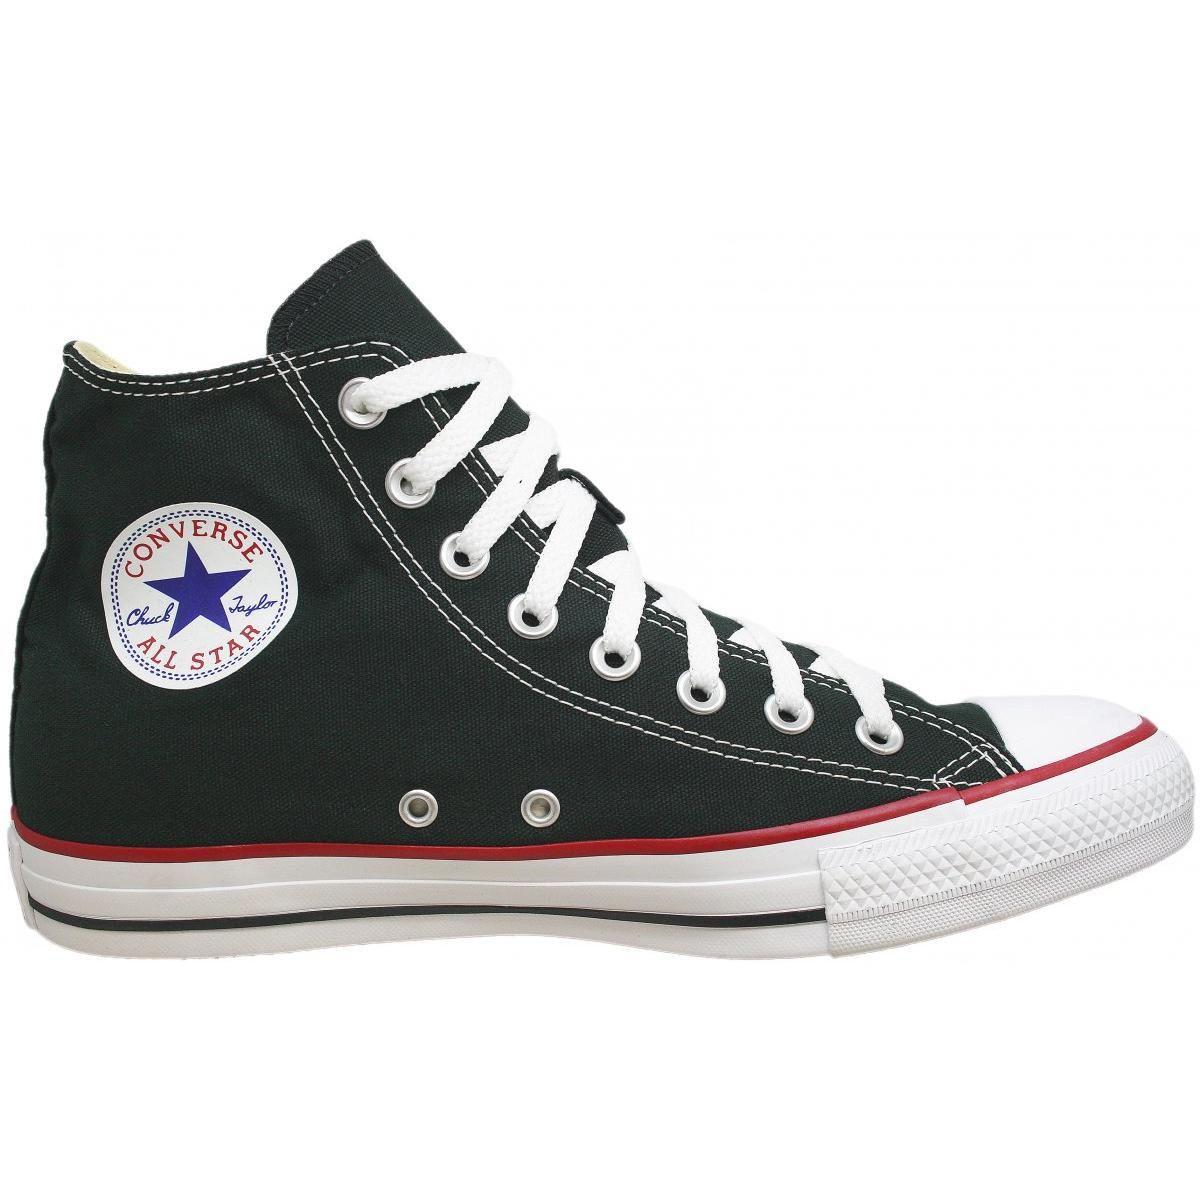 Tênis Converse All Star Chuck Taylor Core HI Cano Alto